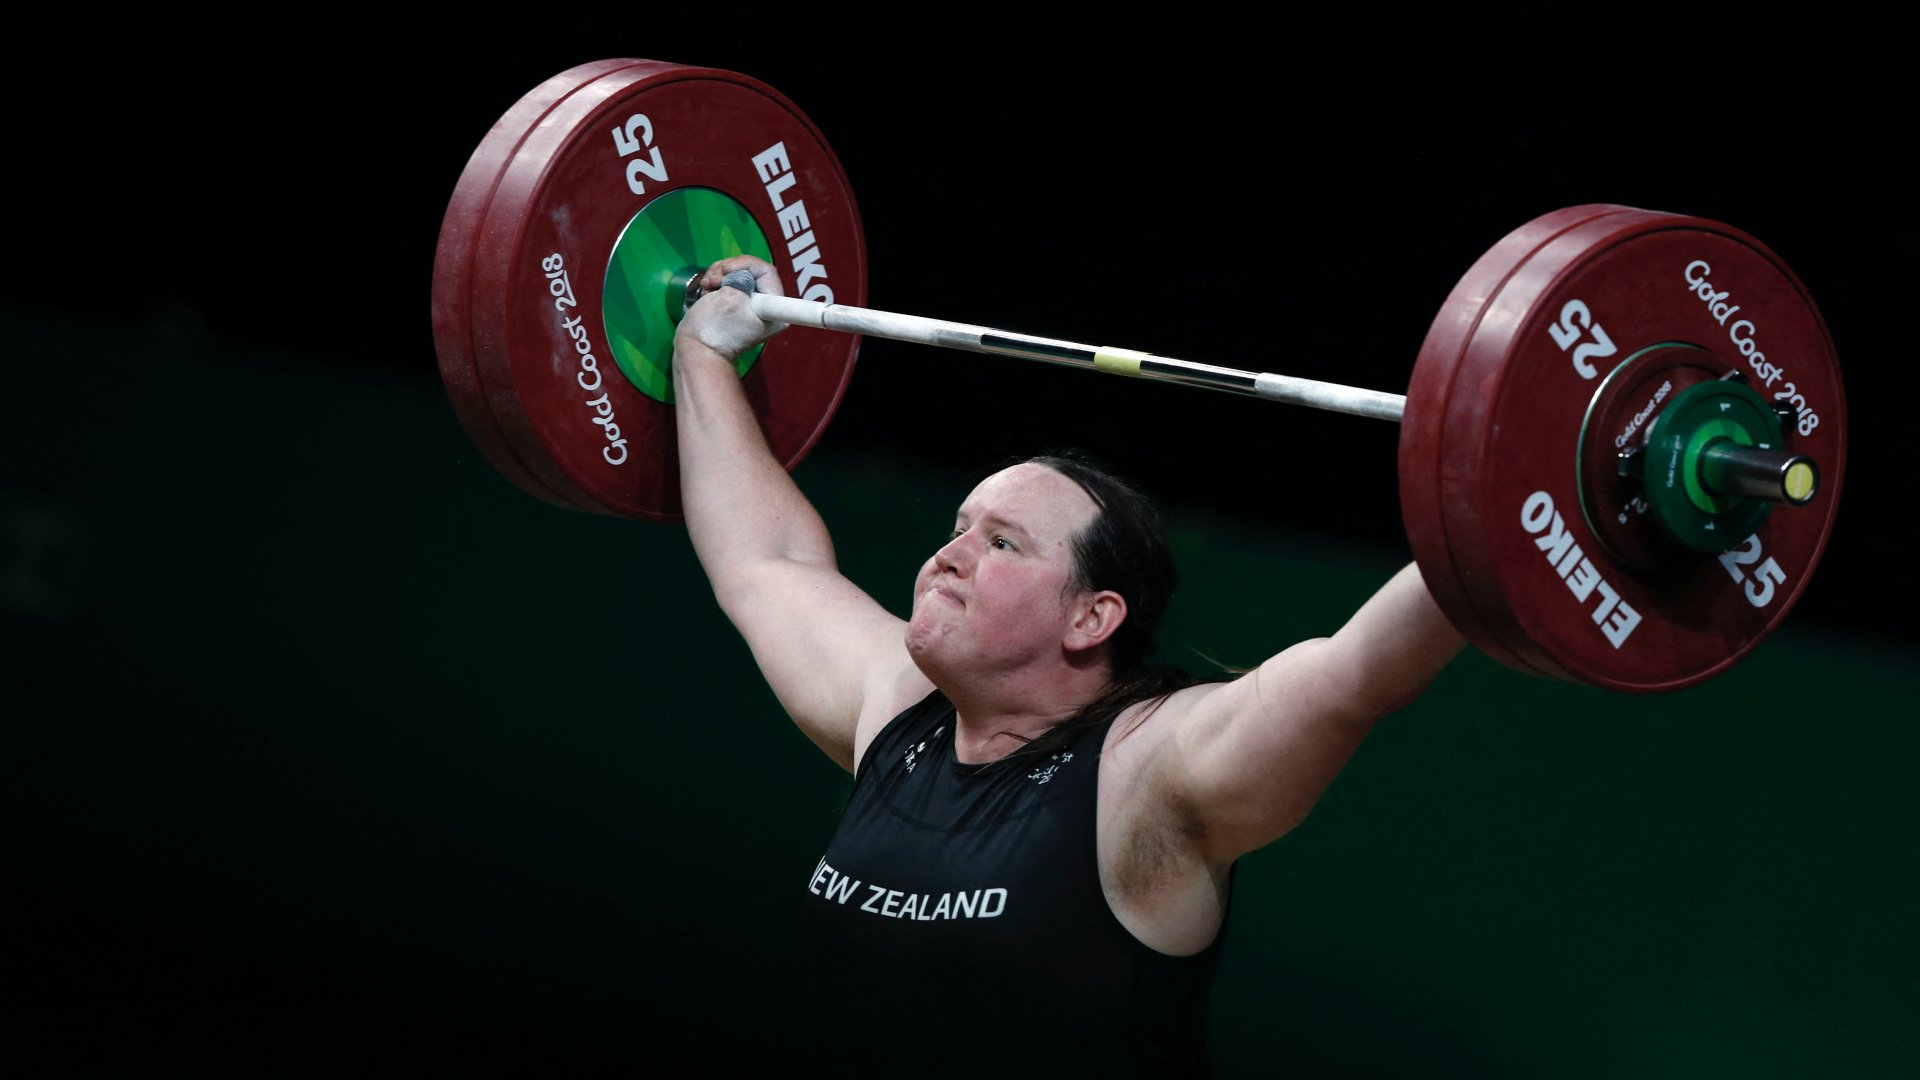 Laurel Hubbard transznemű súlyemelő